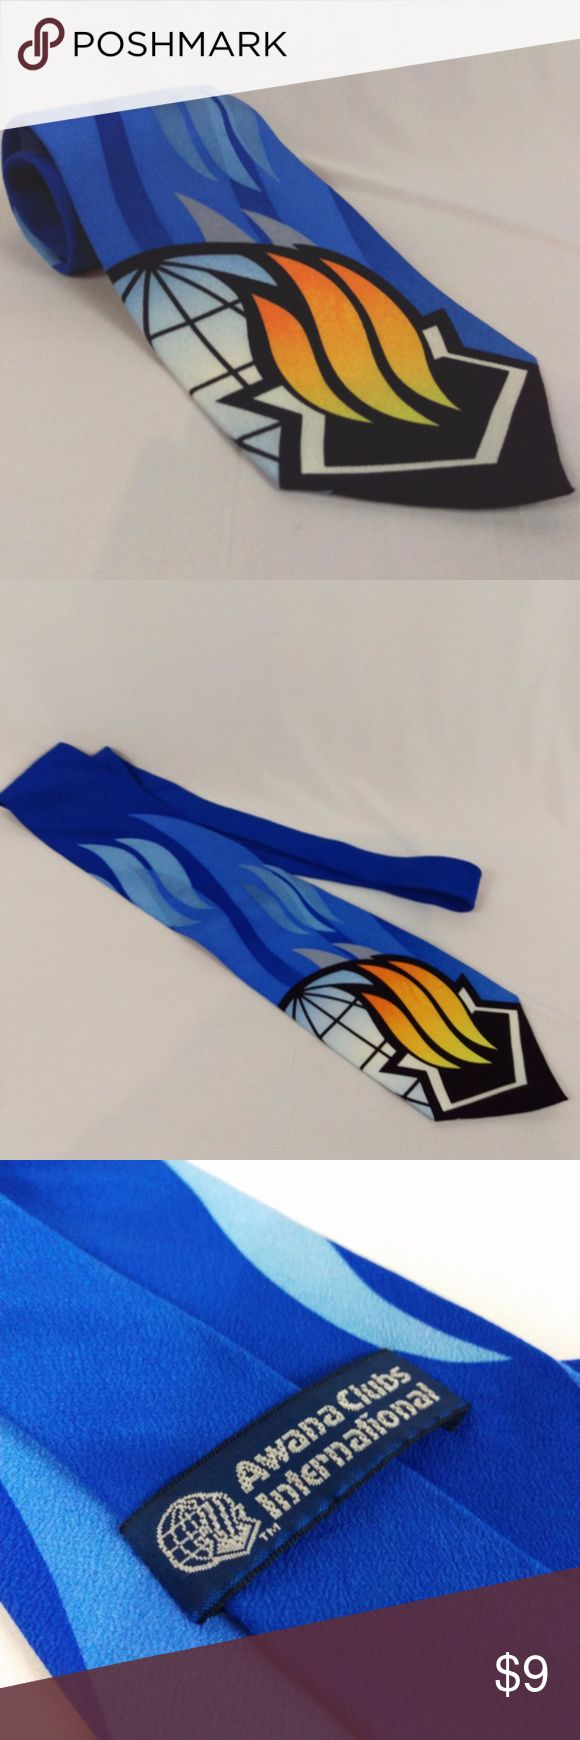 "Awana Club Tie Awana International 100% Silk Awana Club International Dress Tie  100% Silk  Excellent condition. Smoke free. Classic length at 57"" 4"" Width   CT5 Awana Accessories Ties"